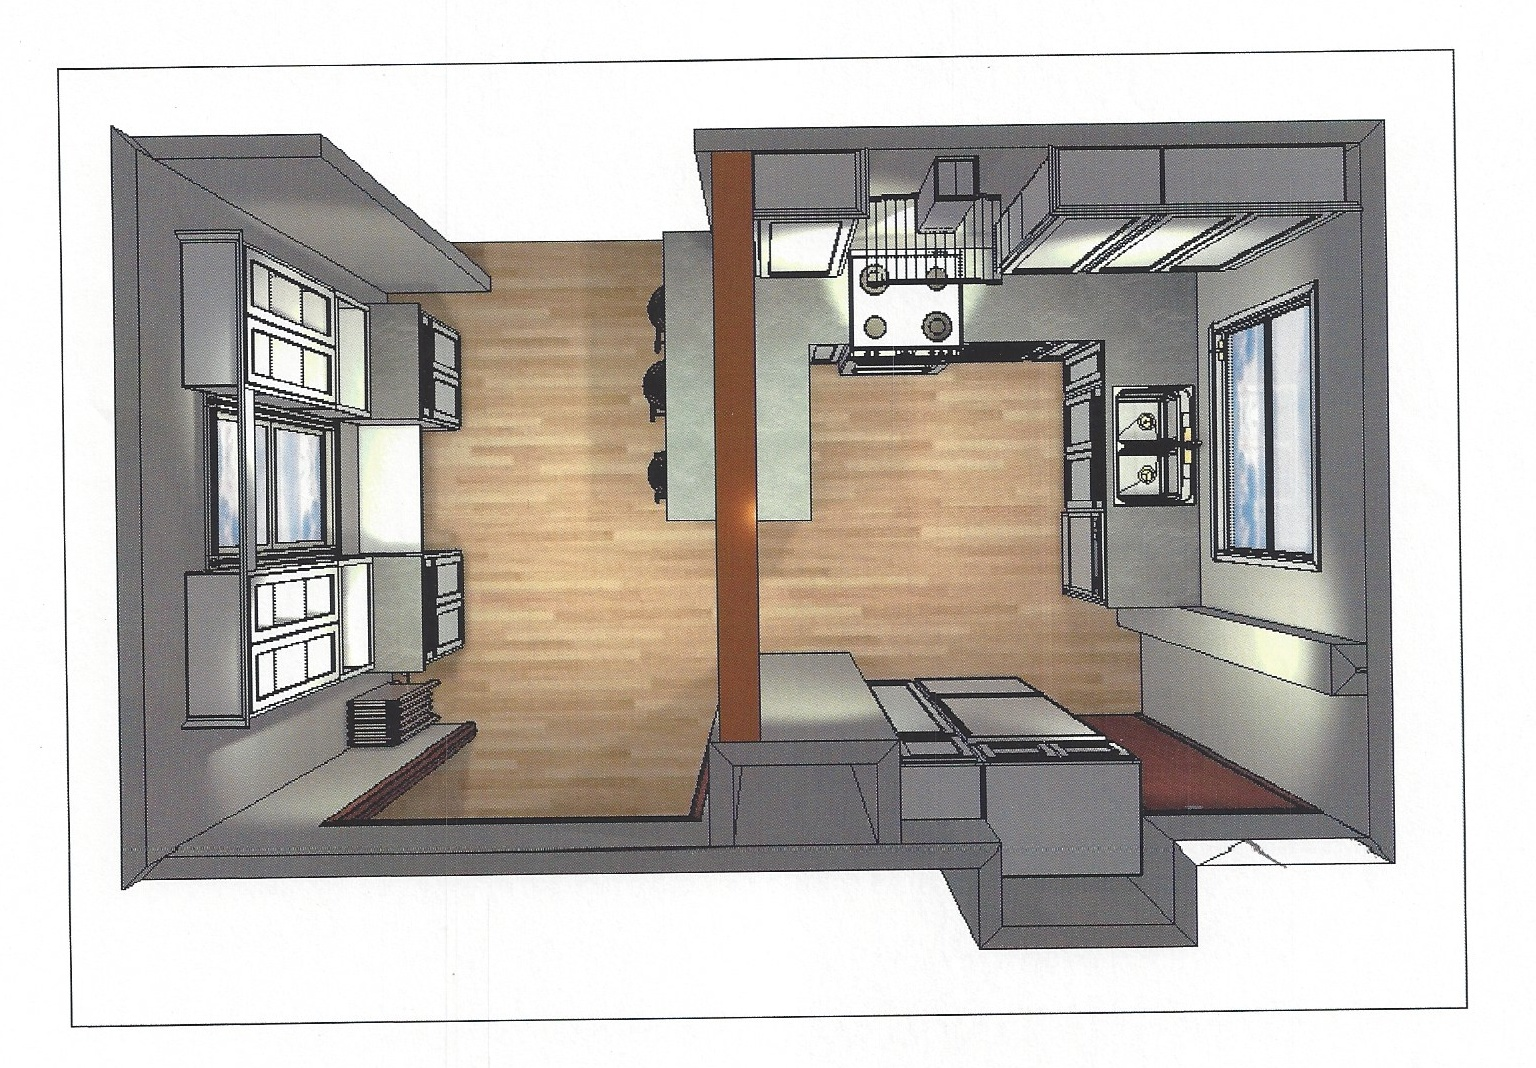 SoPo Cottage: New Englander - Small U Shaped Styles Design - 10 By 10 U Shaped Kitchen Design